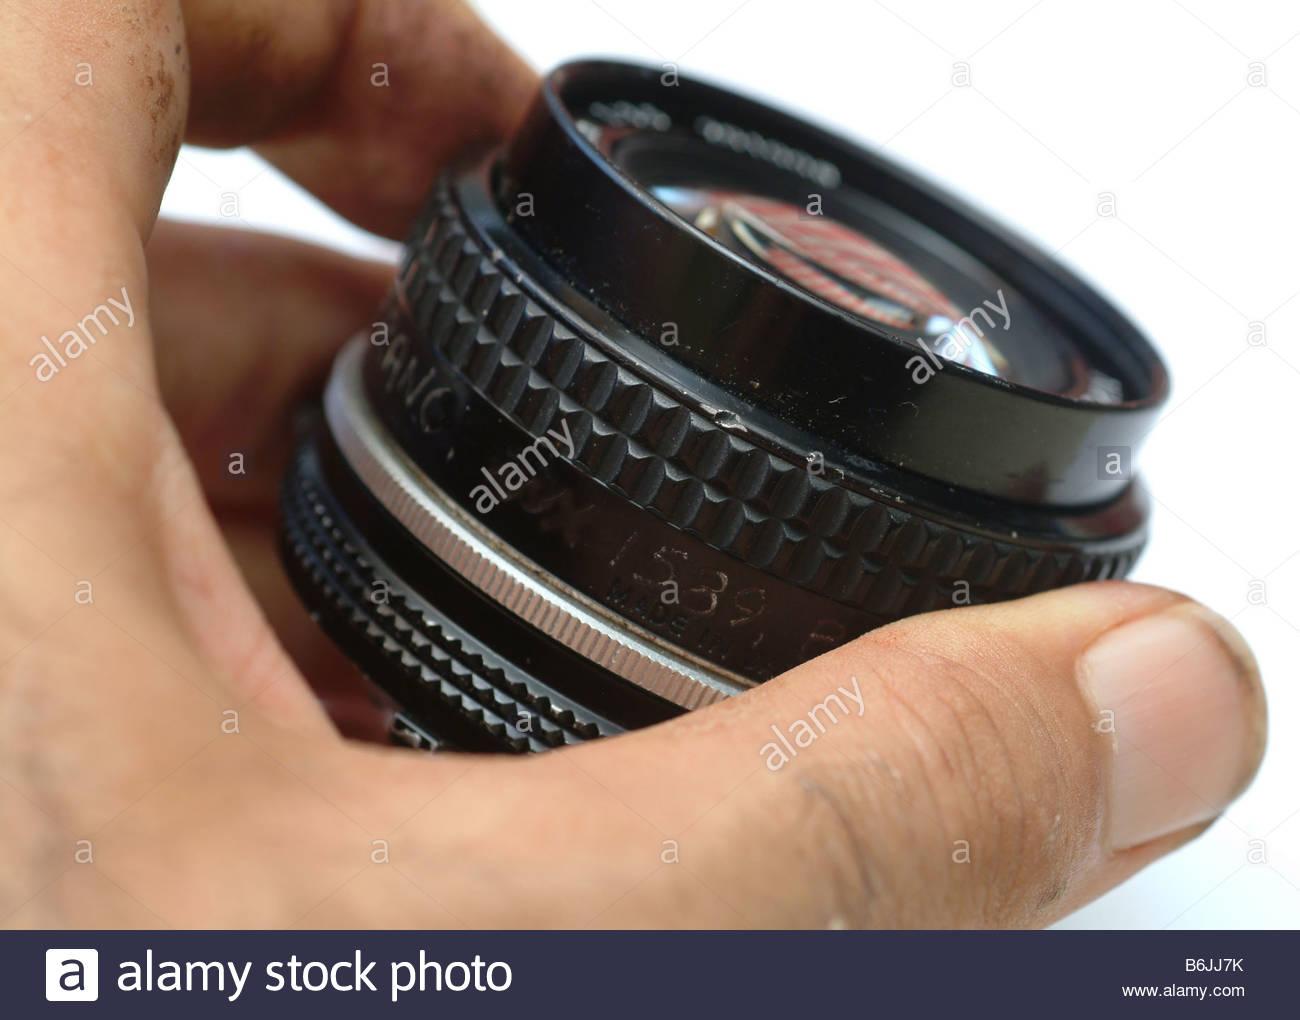 Camera lens 24mm wide angle manual focus 24 f2 8 Nikon 2 8